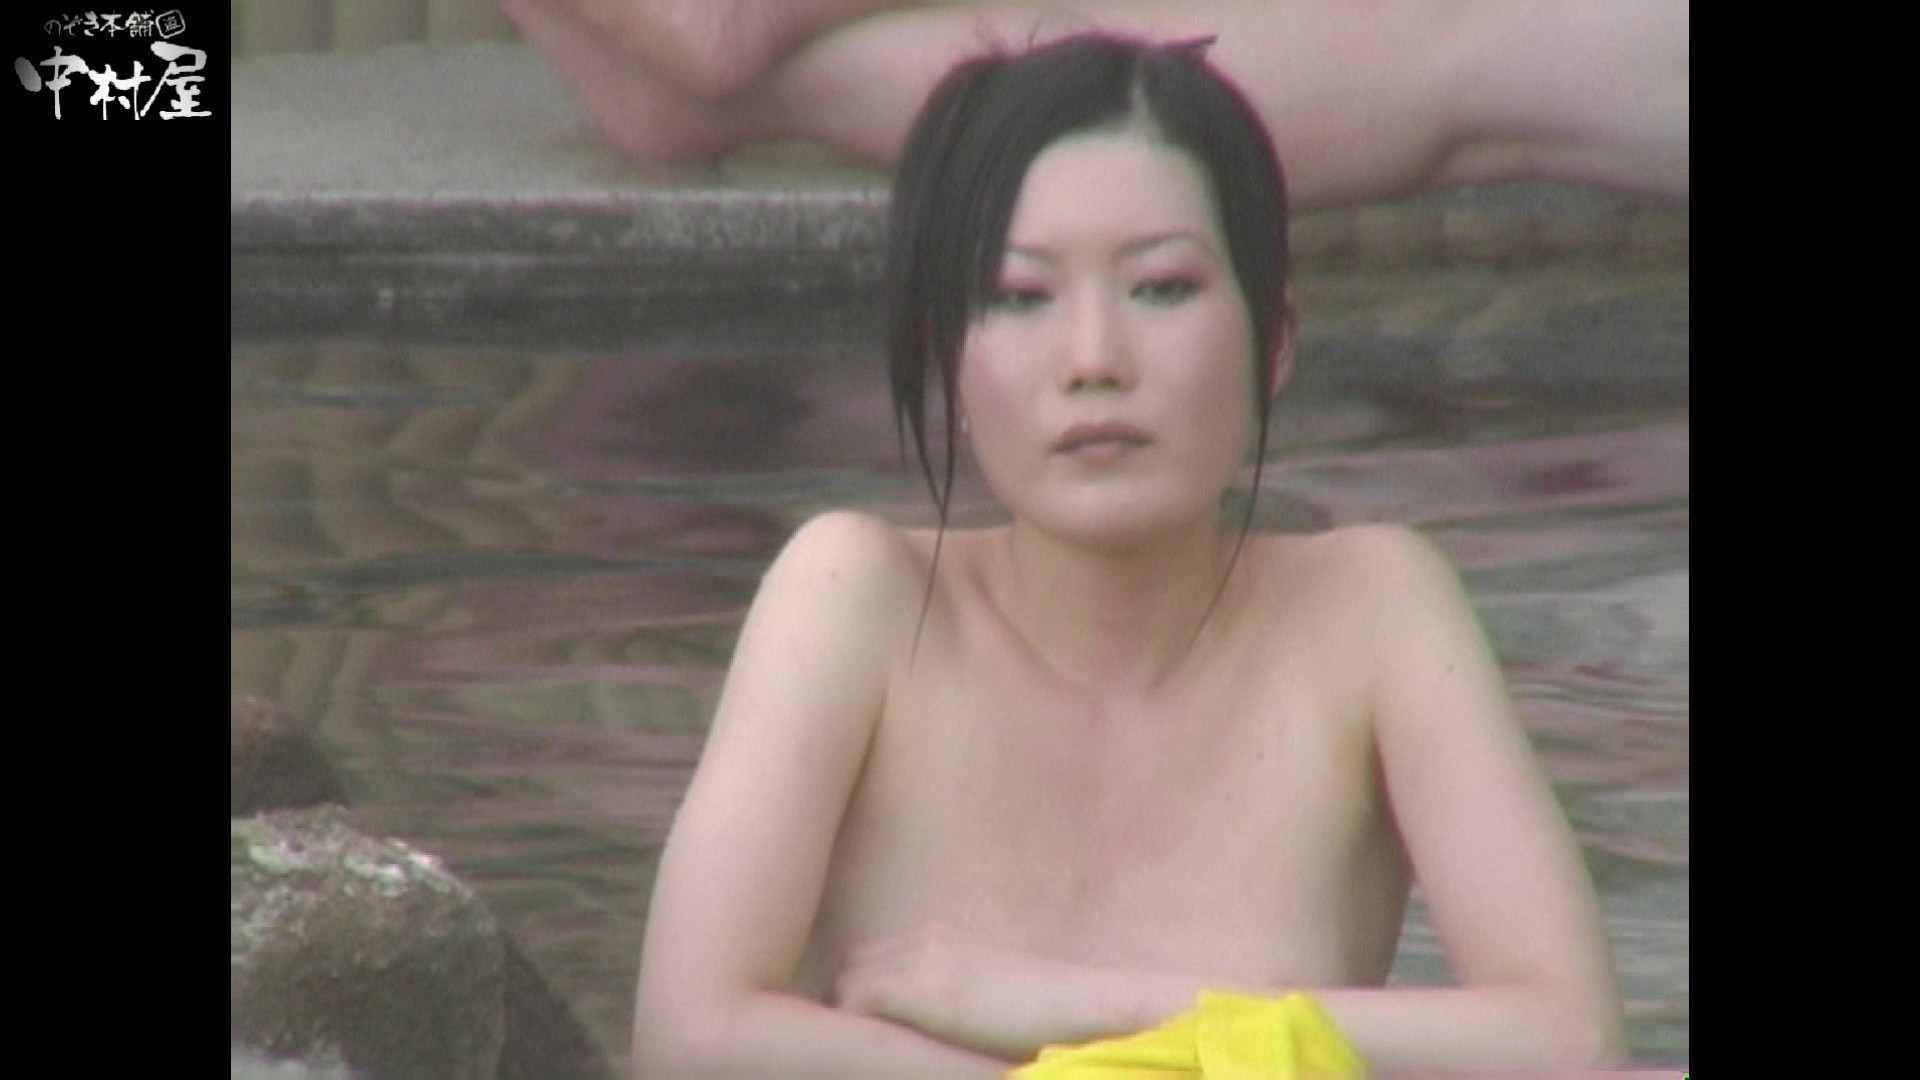 Aquaな露天風呂Vol.940 OLセックス | 露天  98画像 43